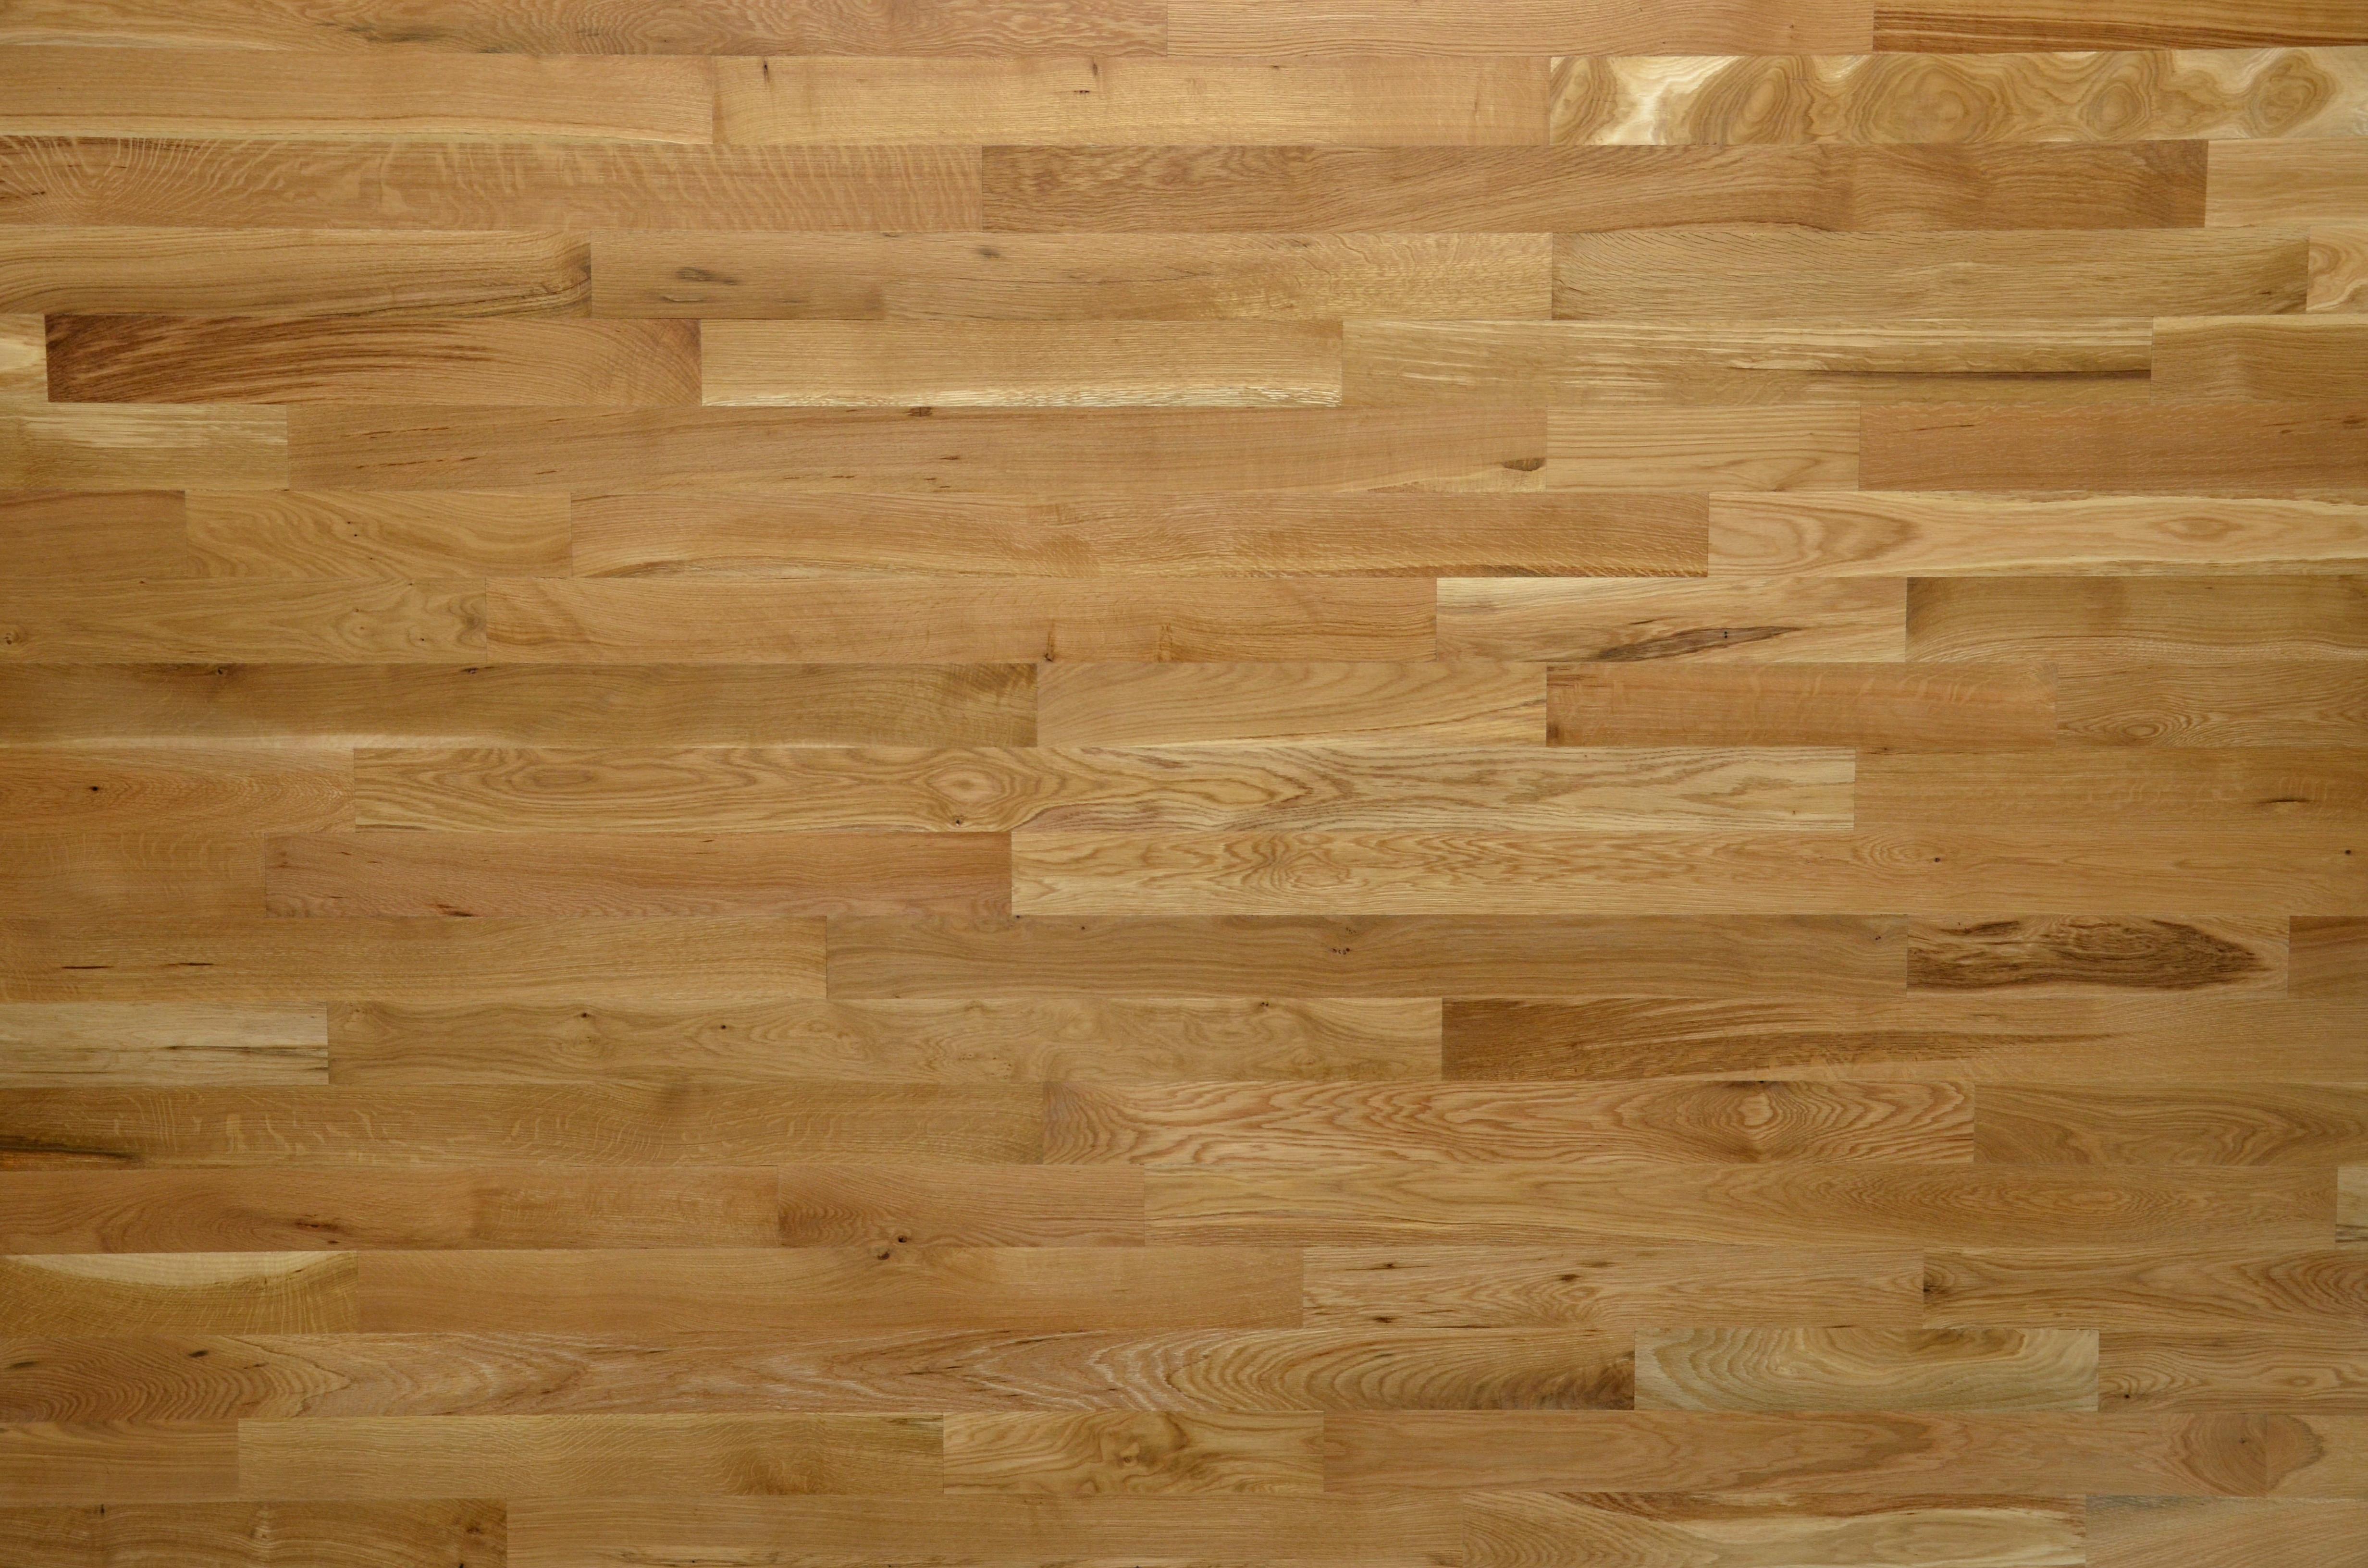 red oak hardwood floor colors of lacrosse hardwood flooring walnut white oak red oak hickory inside 1 common white oak